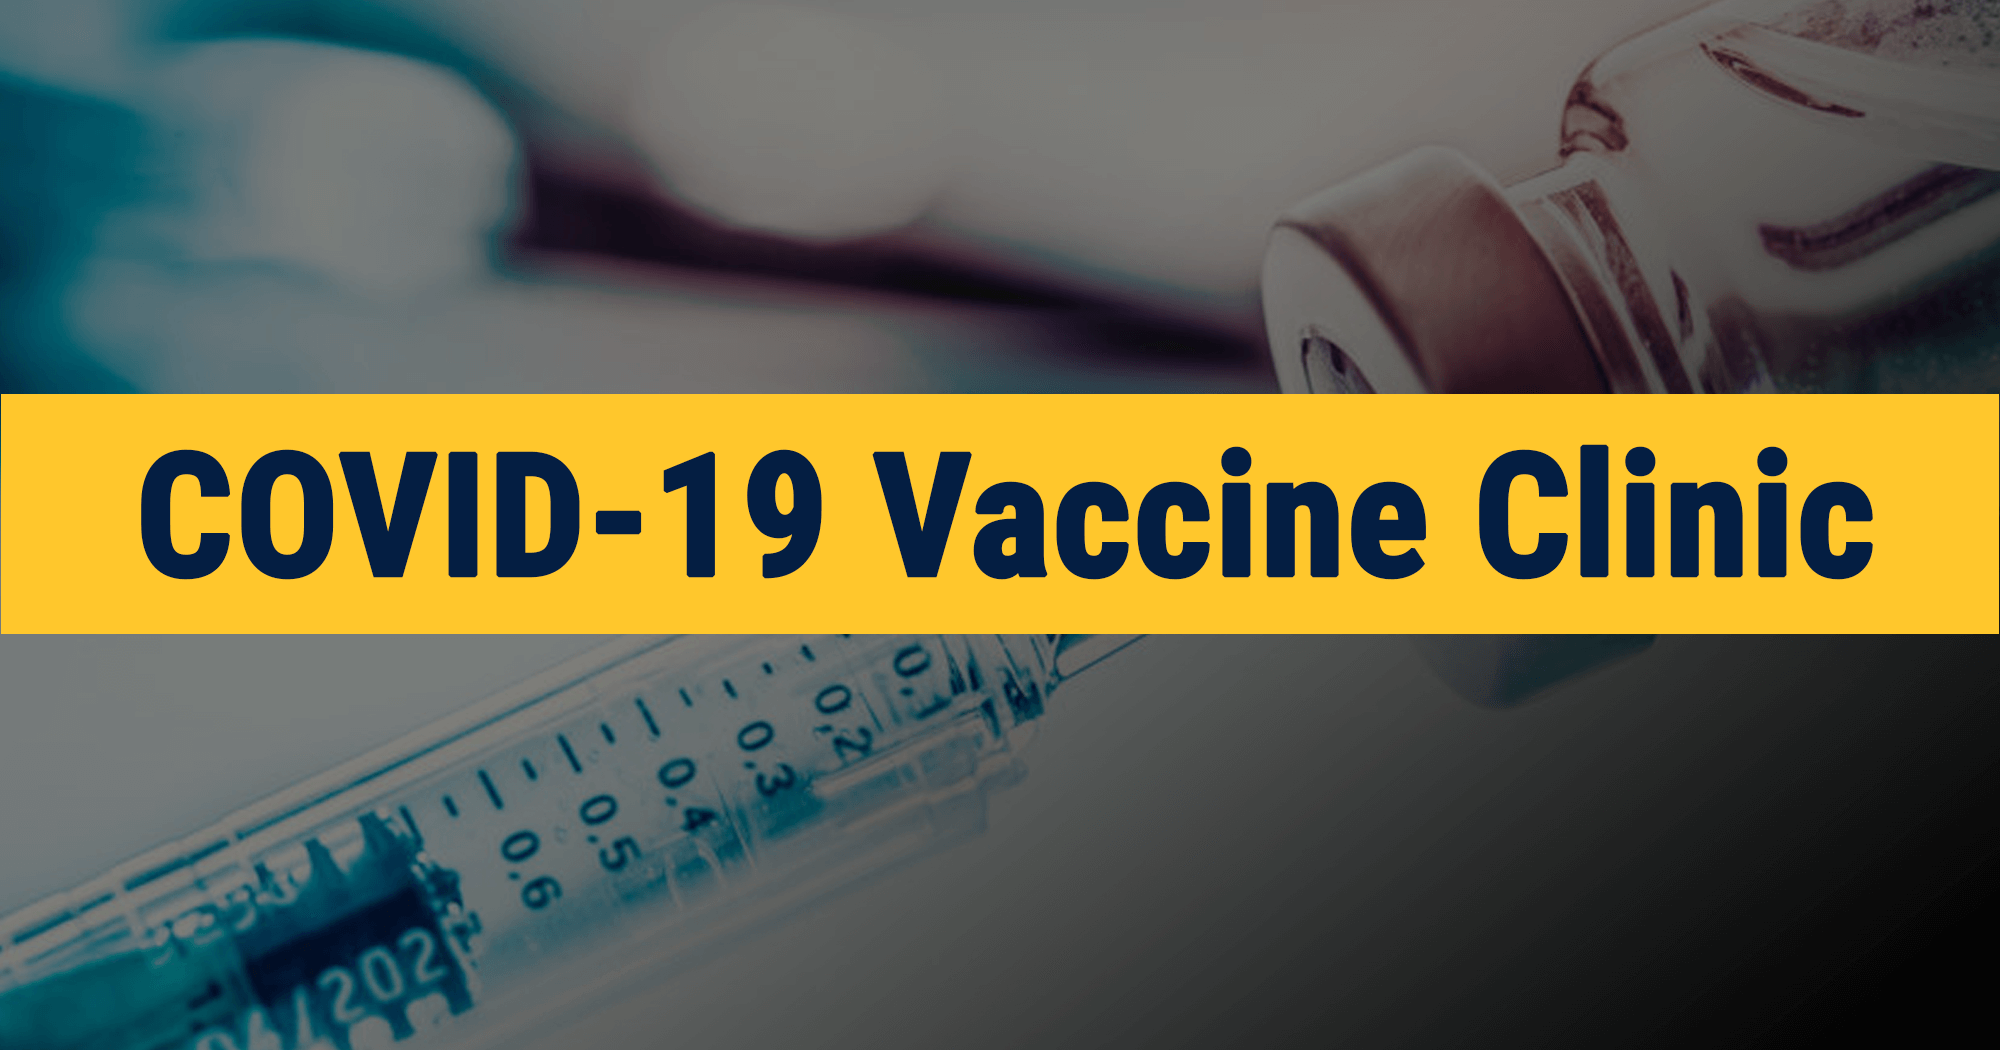 image for COVID-19 Vaccine Clinics